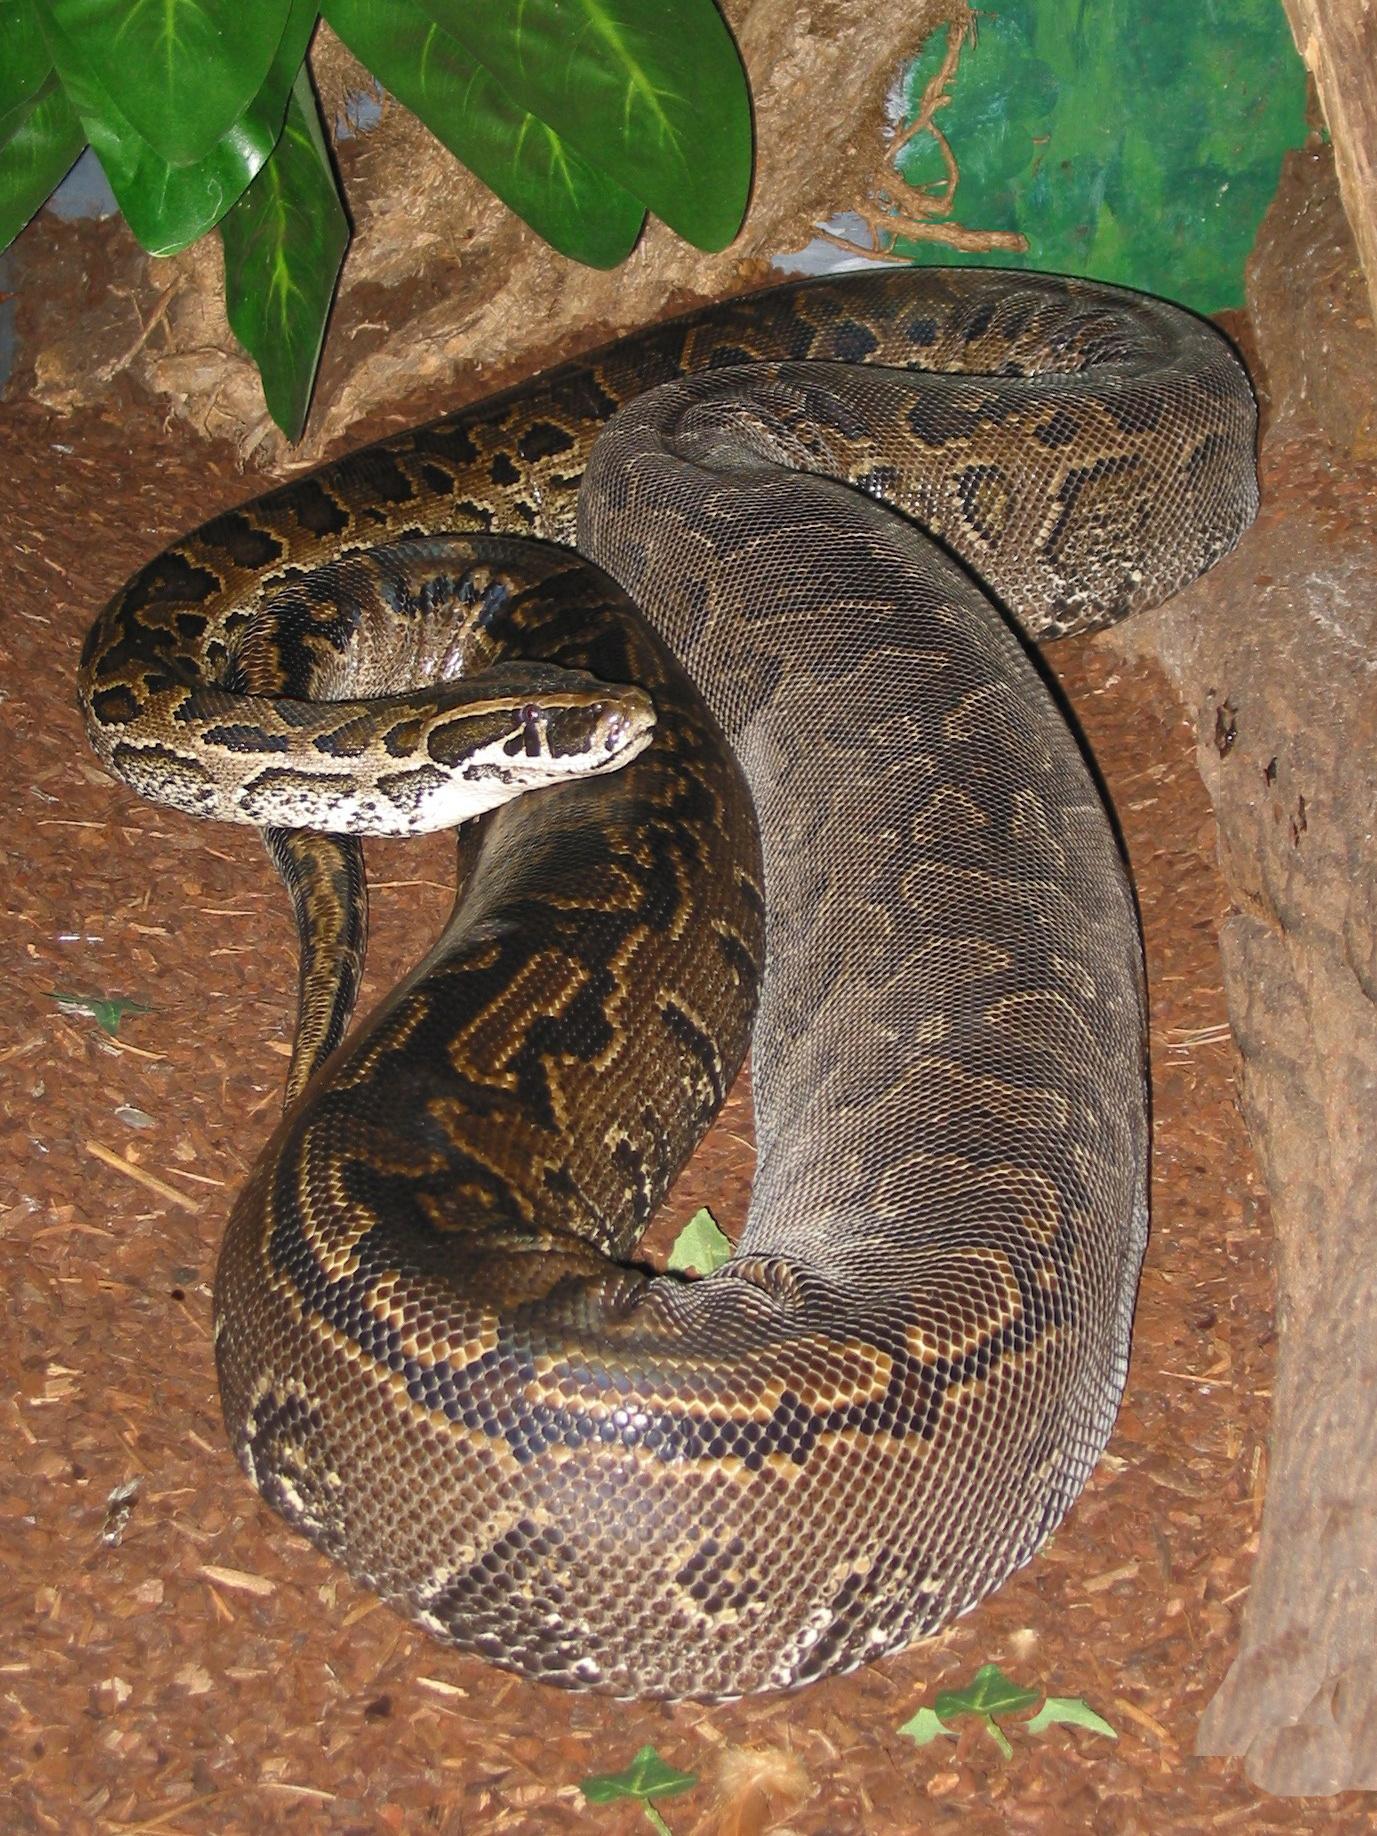 African rock python - Wikipedia